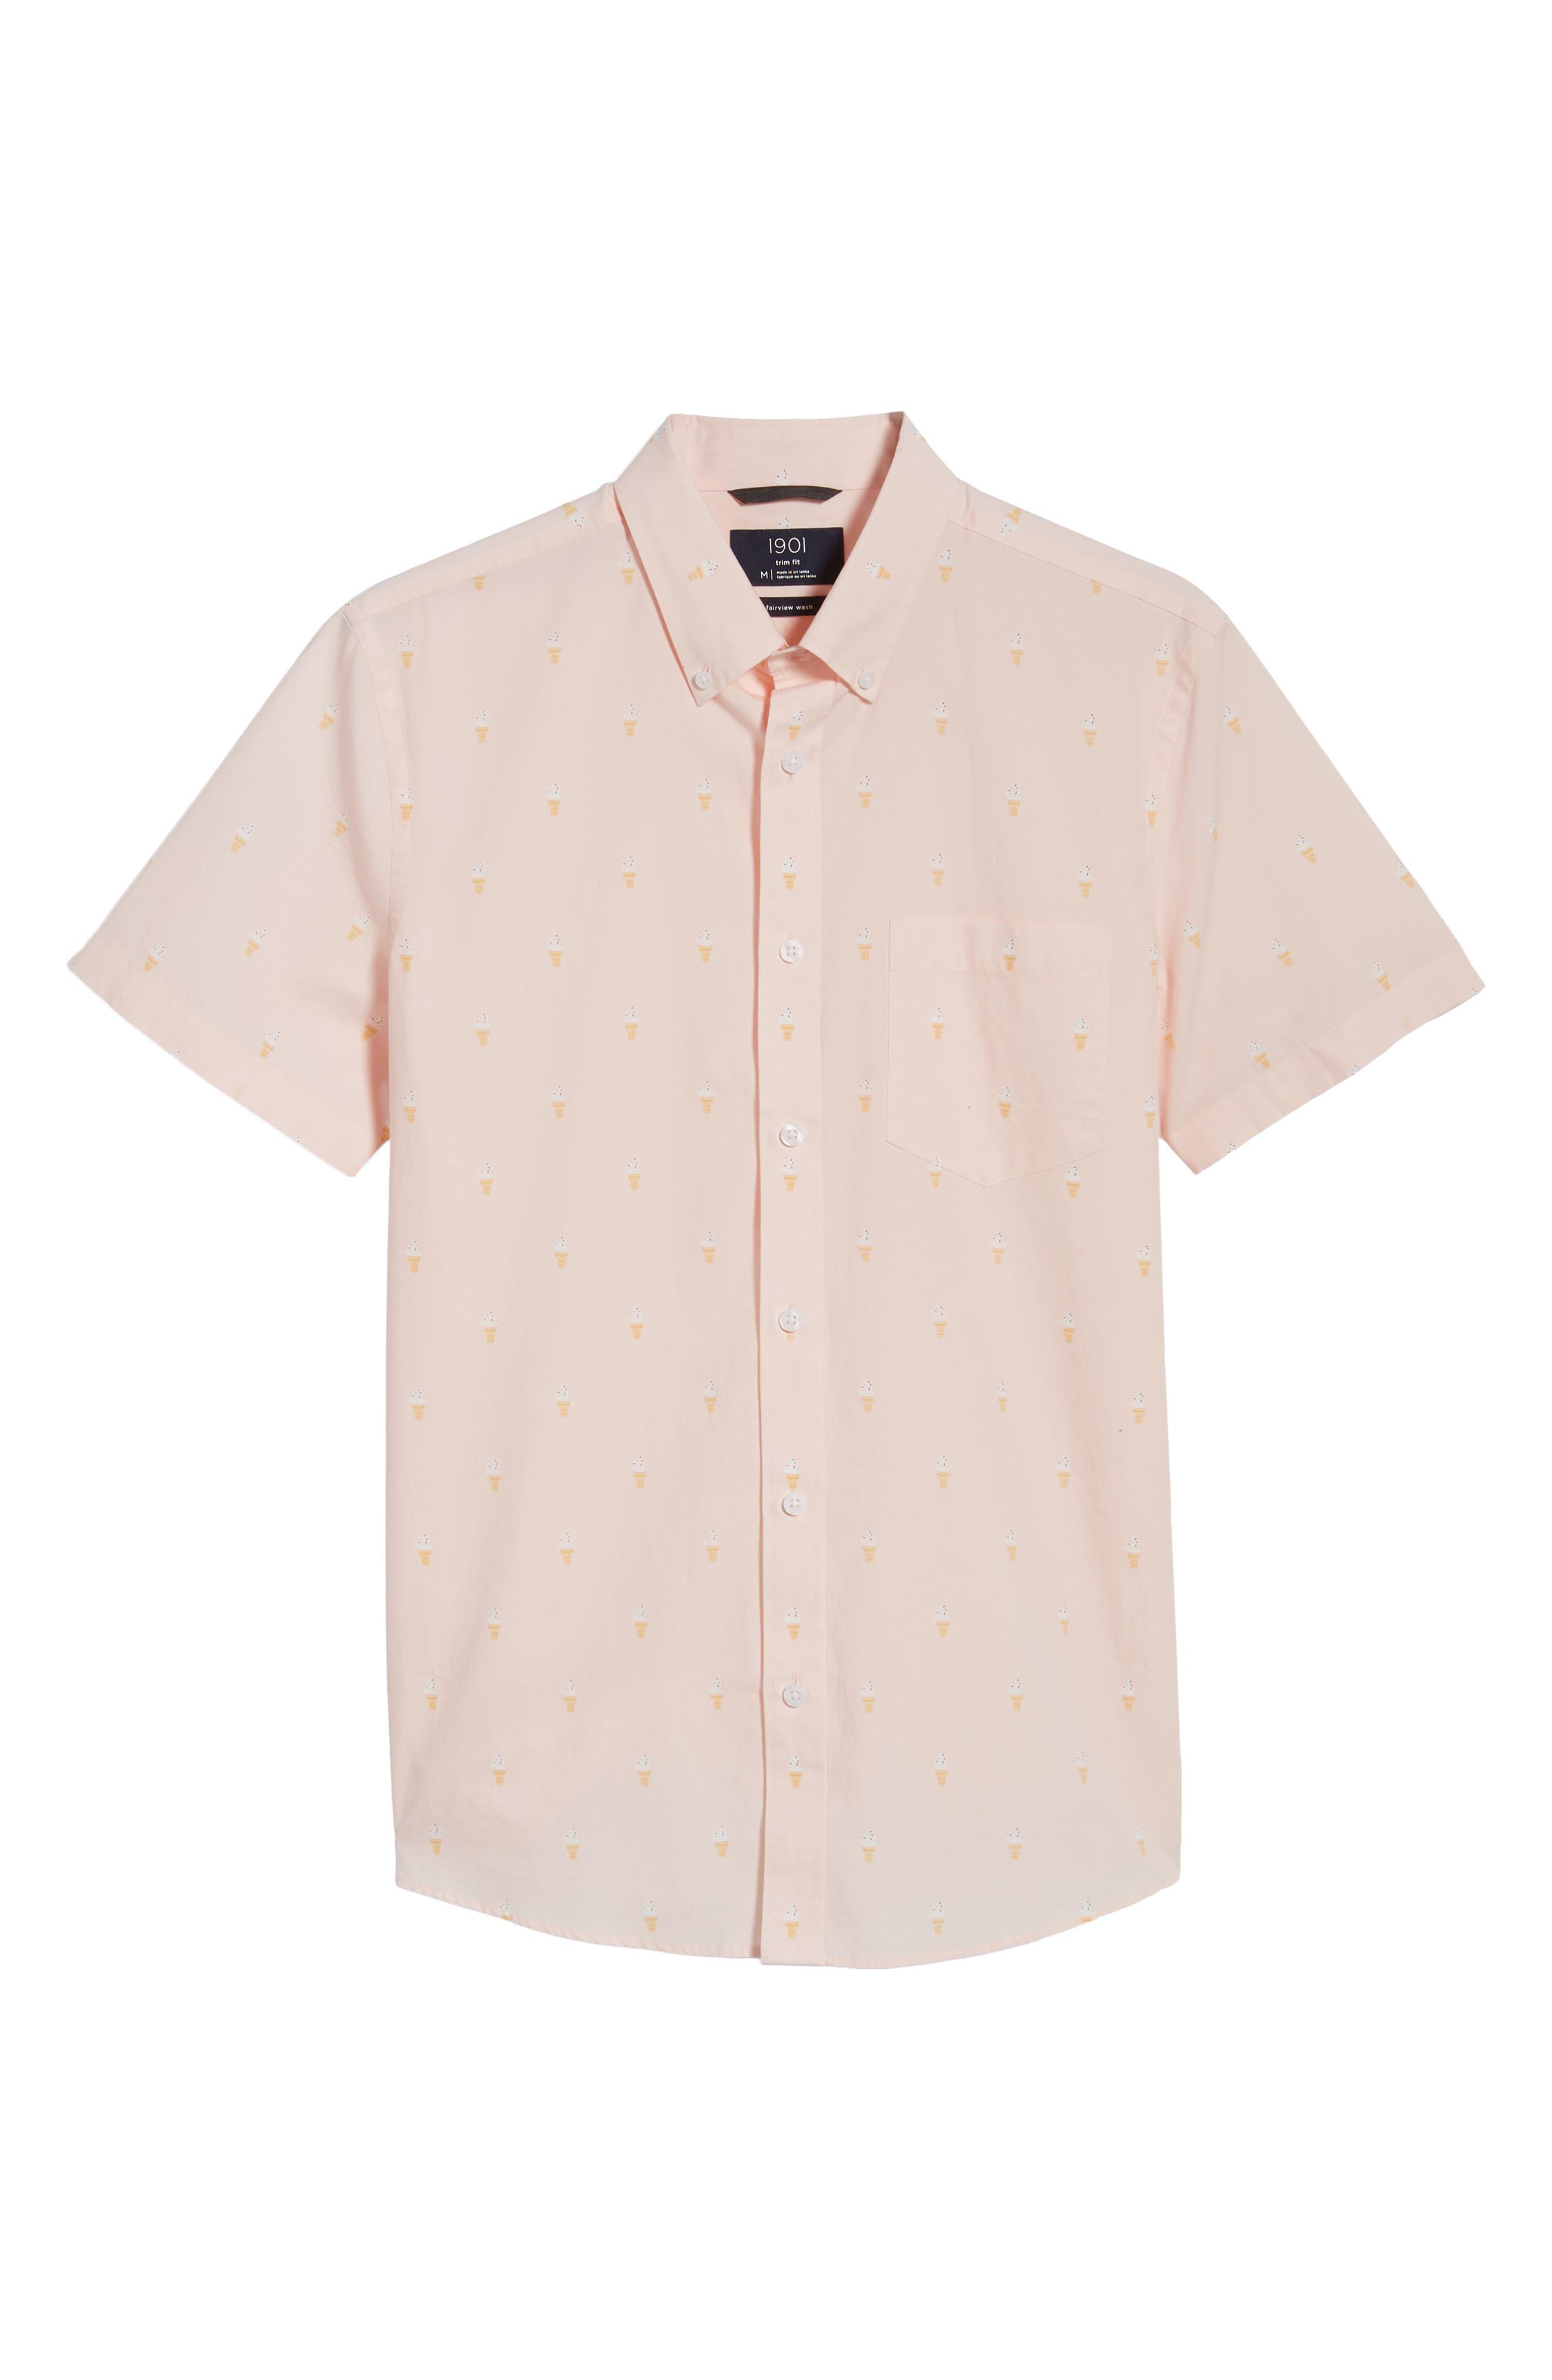 Trim Fit Print Short Sleeve Sport Shirt,                             Alternate thumbnail 6, color,                             Pink Breathe Ice Cream Cones